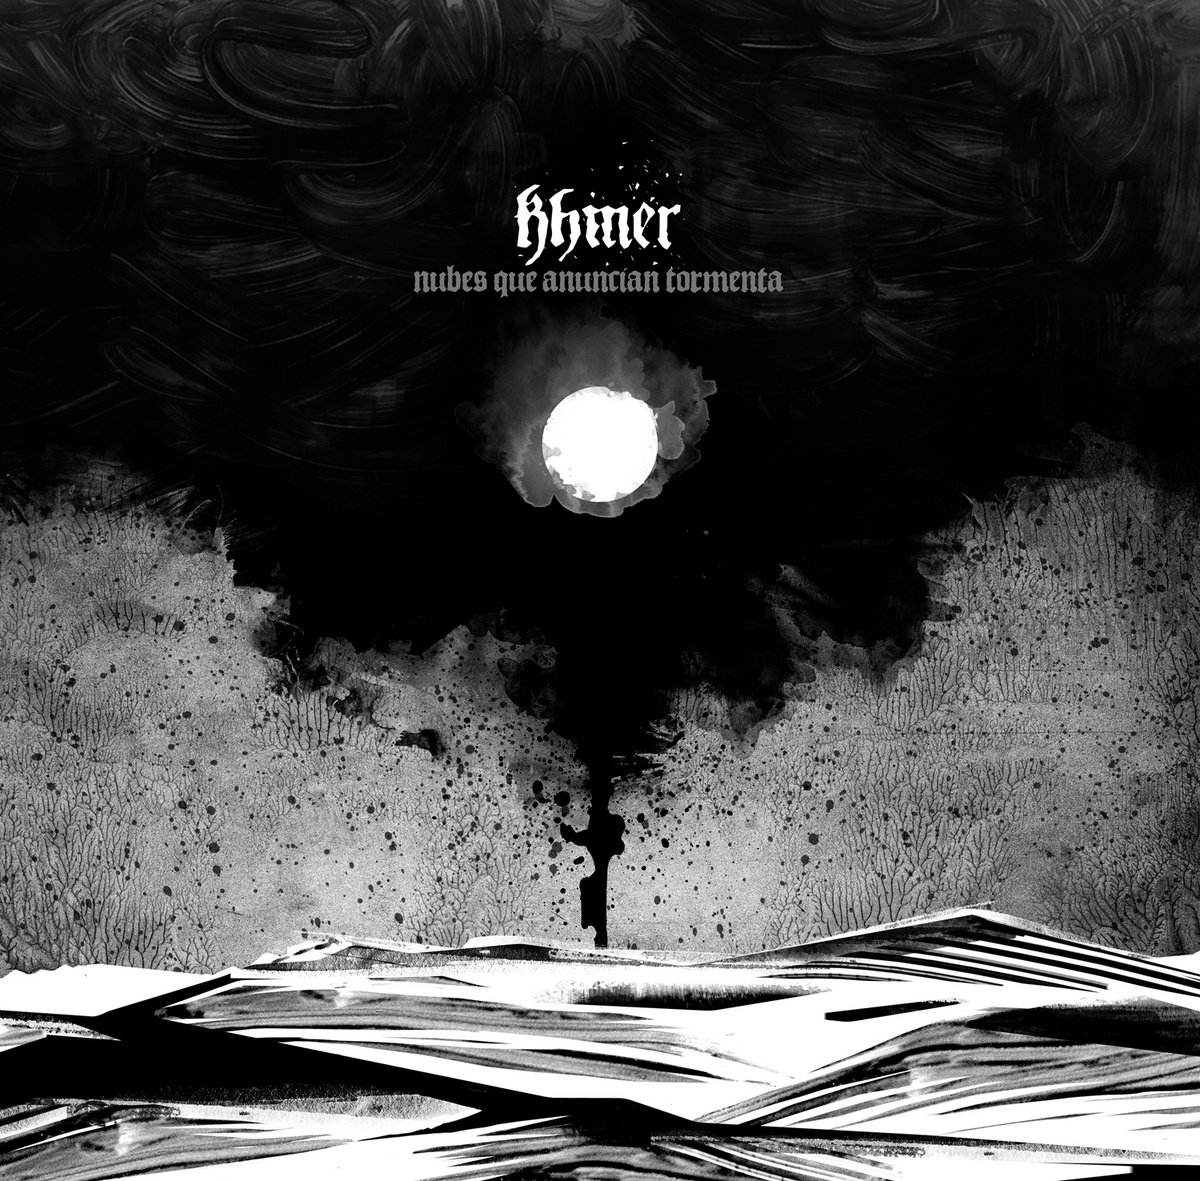 Khmer - Lenguas De Fuego @ 'Nubes Que Anuncian Tormenta' album (metal, spain)